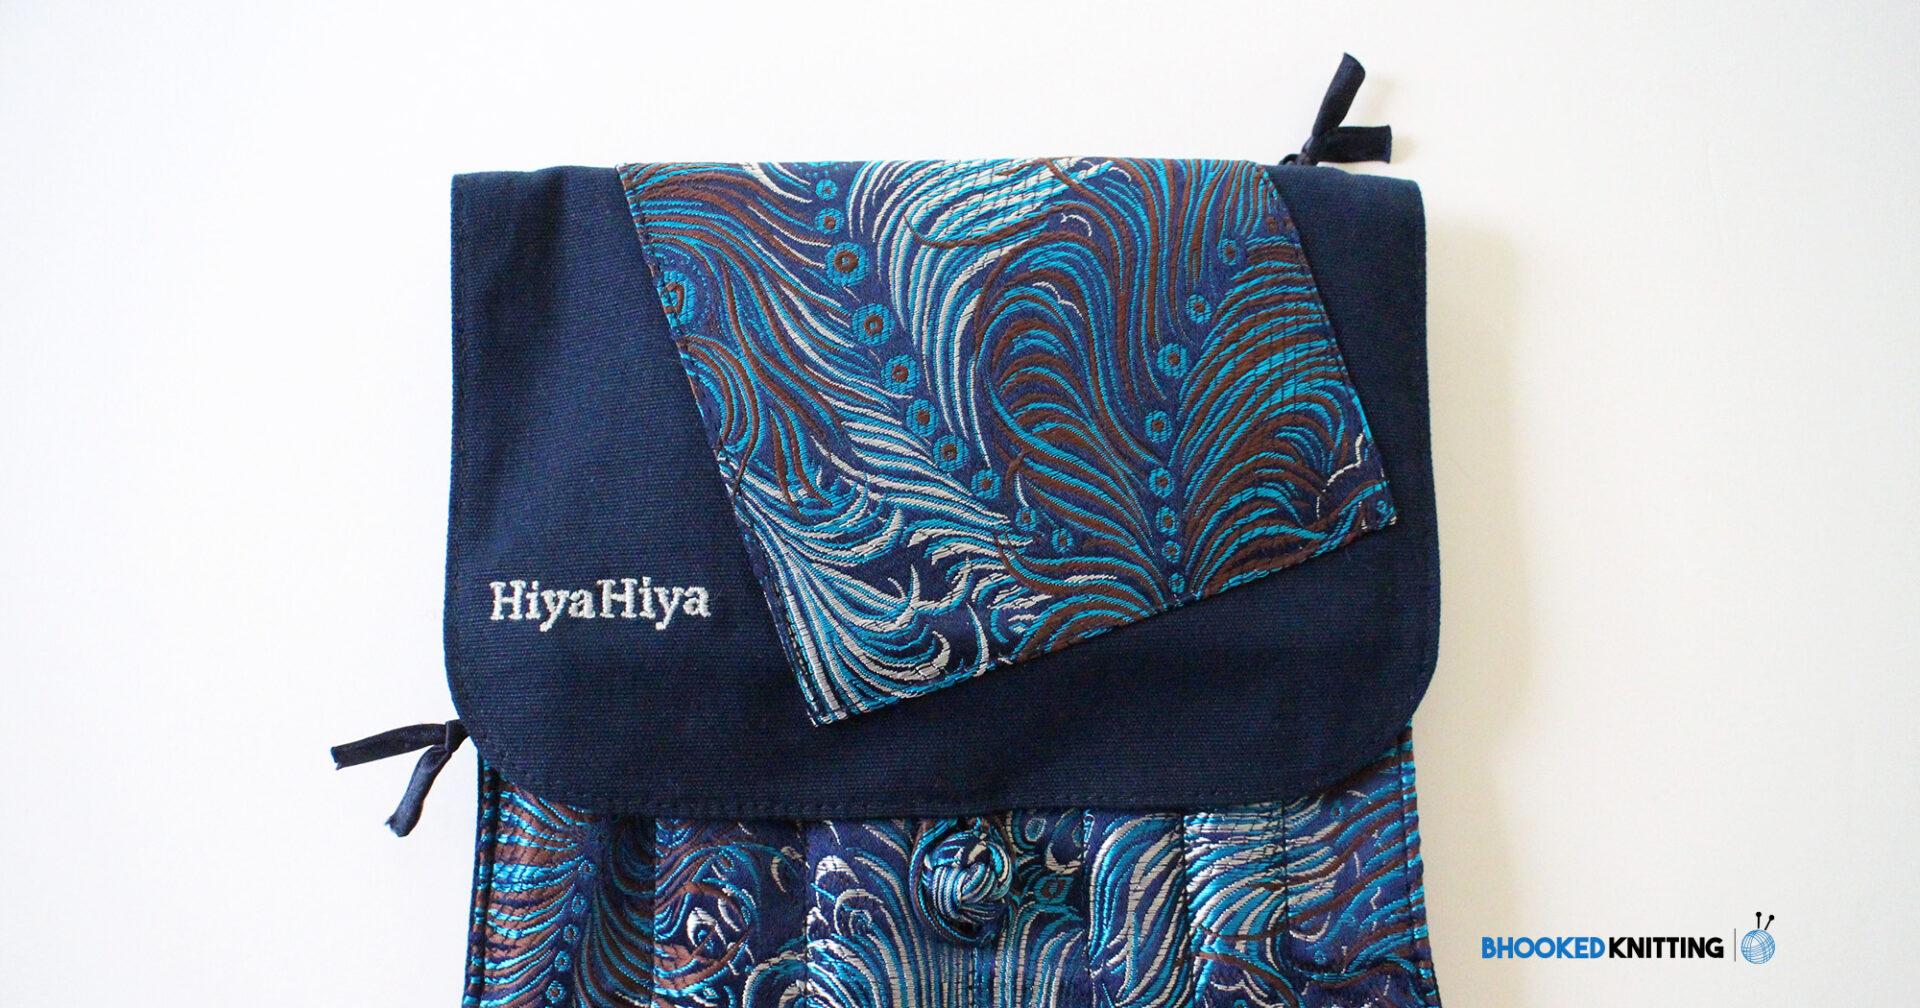 Hiya Hiya Knitting Needle Review - Interchangeable Set